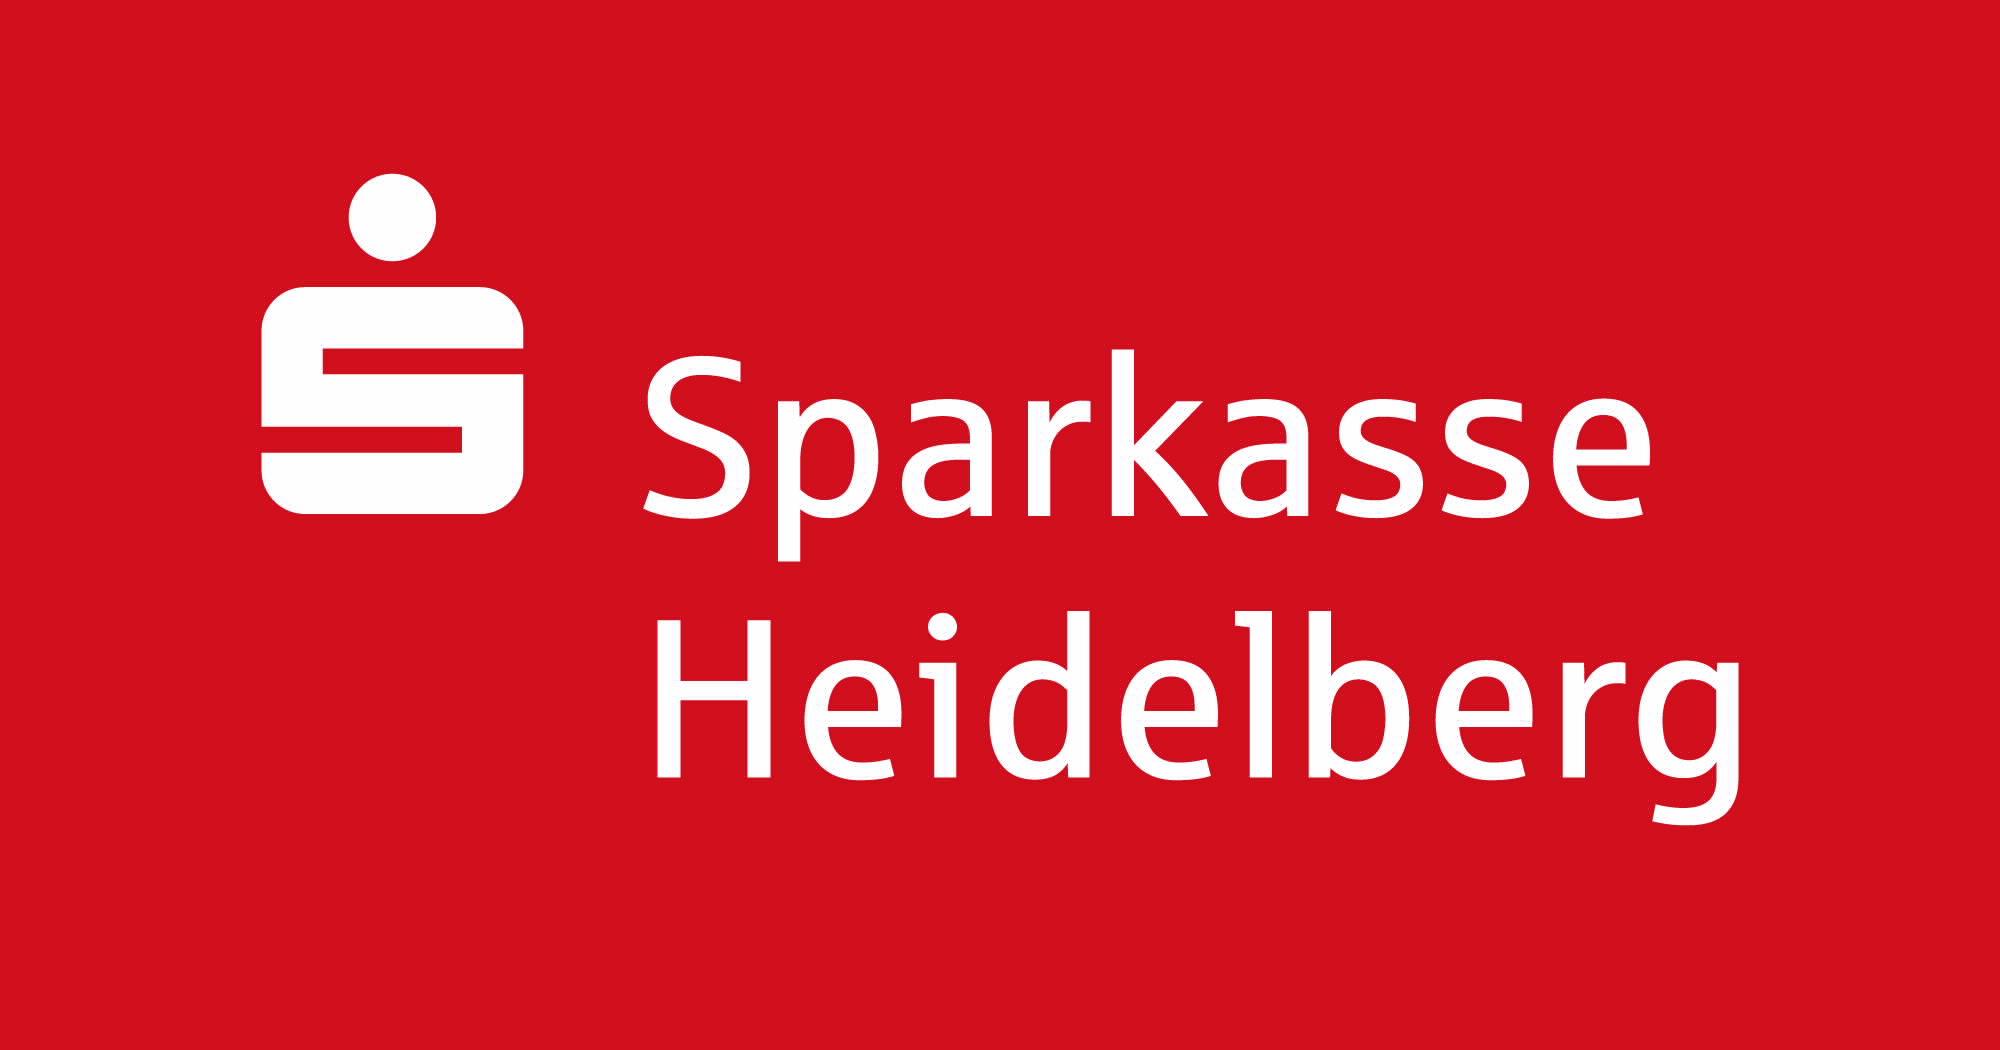 Sparkasse-HD-Logo